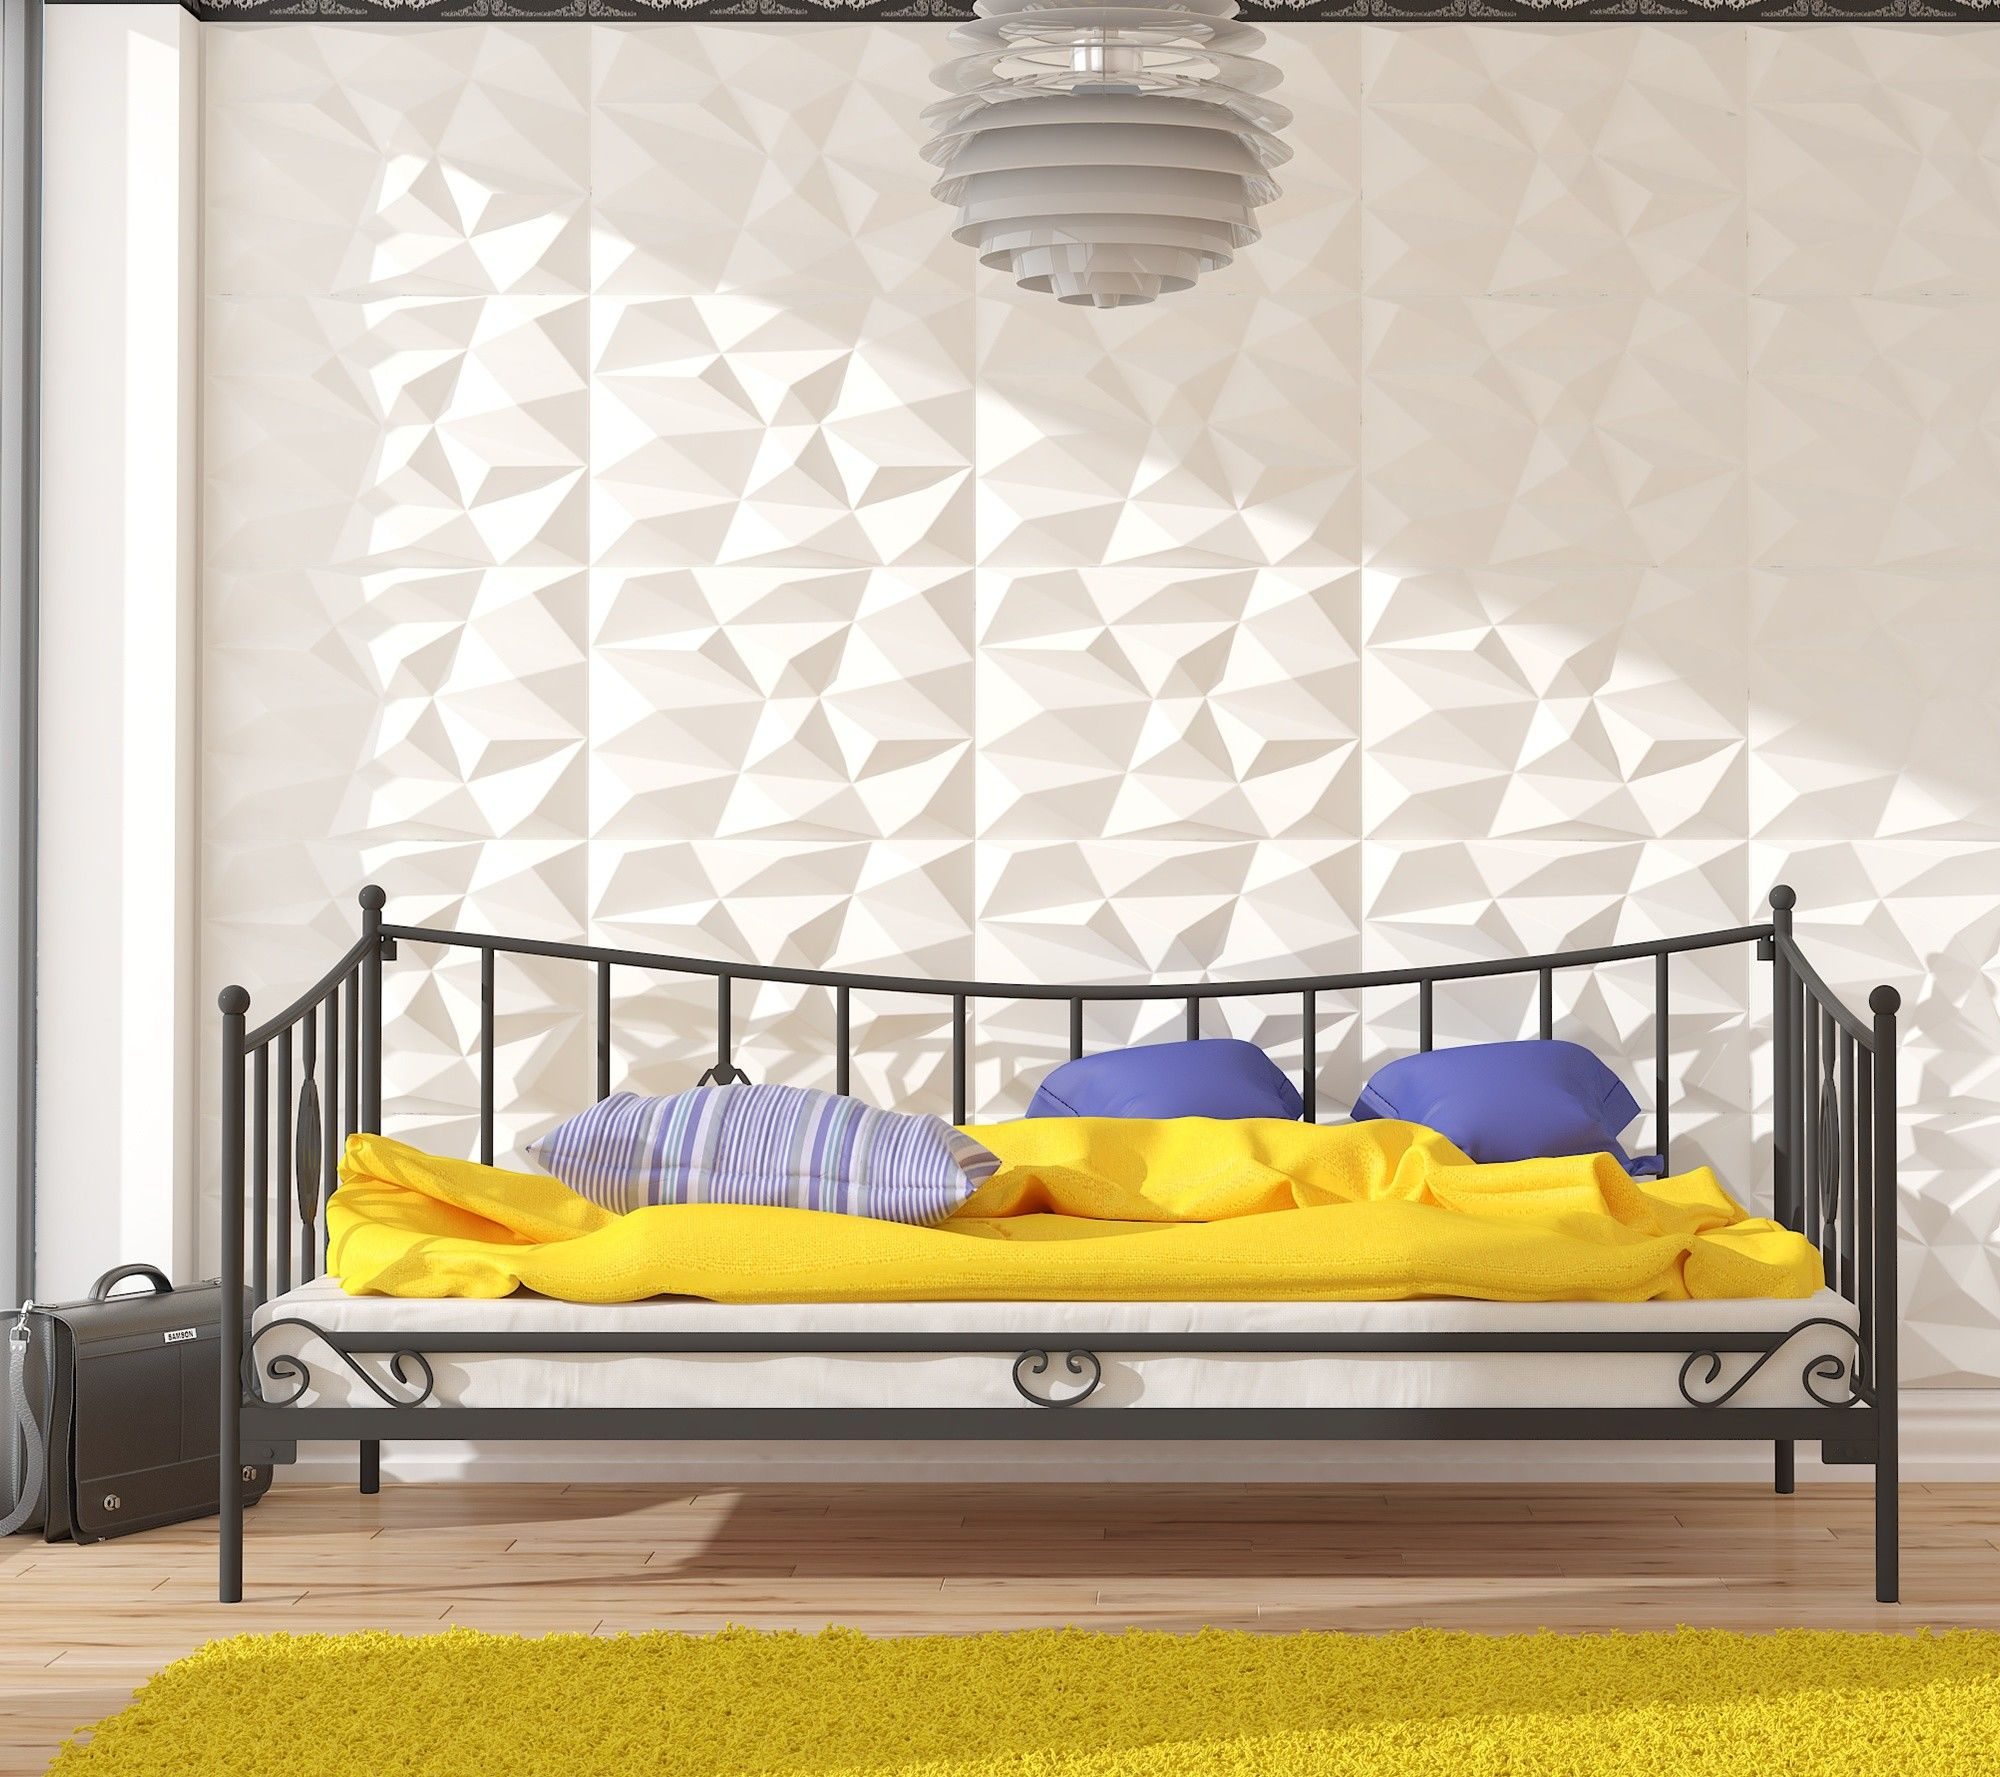 Łóżko metalowe sofa 100x200 wzór 31 ze stelażem